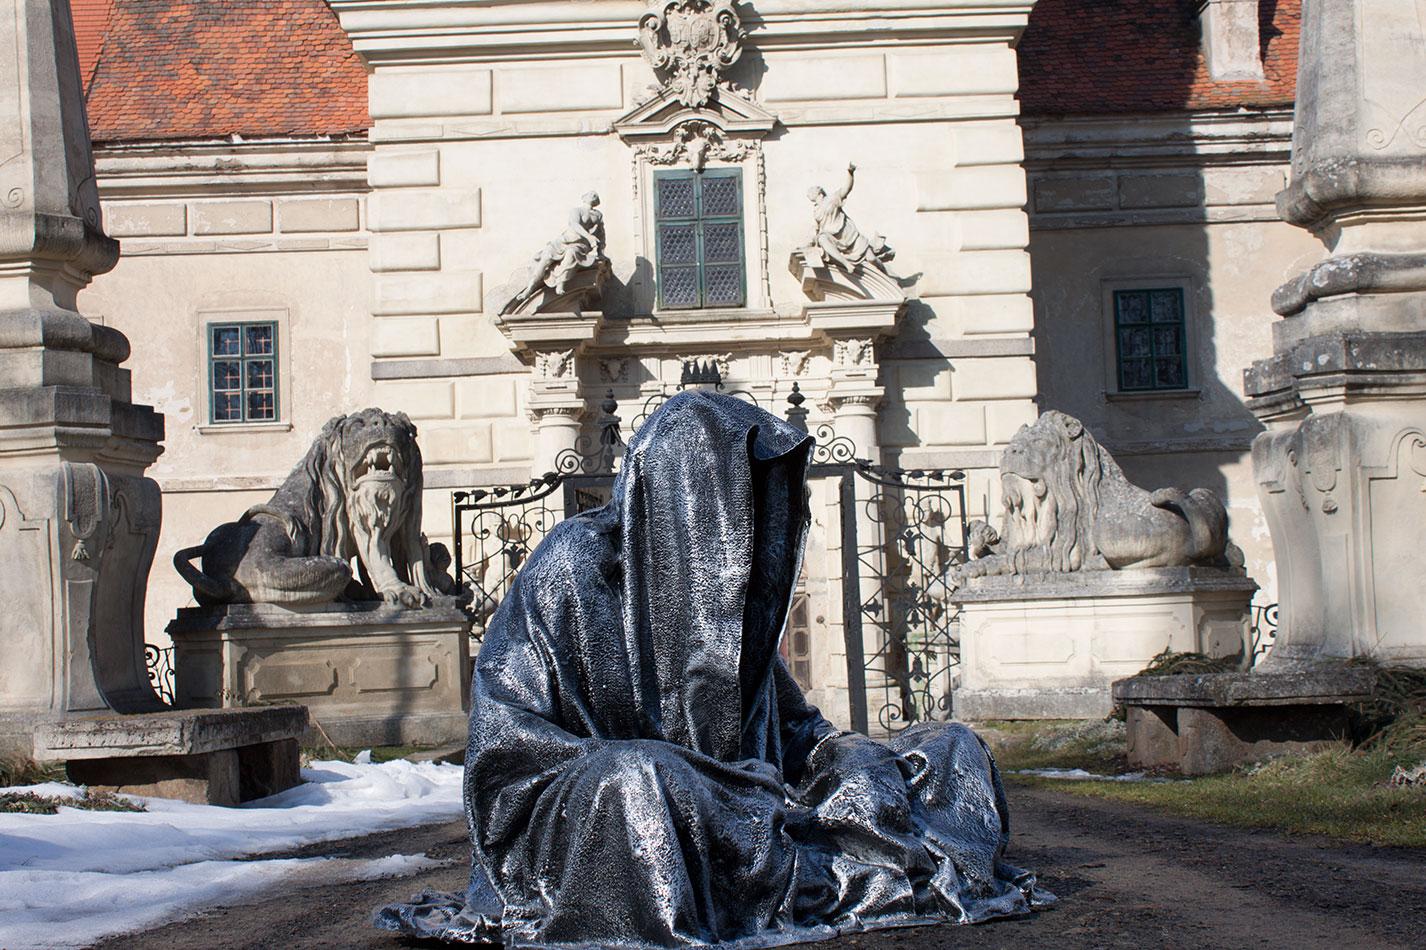 castle-greilenstein-lower-austria-wood-quater-waldviertel-guardians-of-time-contemporary-art-sculpture-design-antique-manfred-kielnhofer-7406